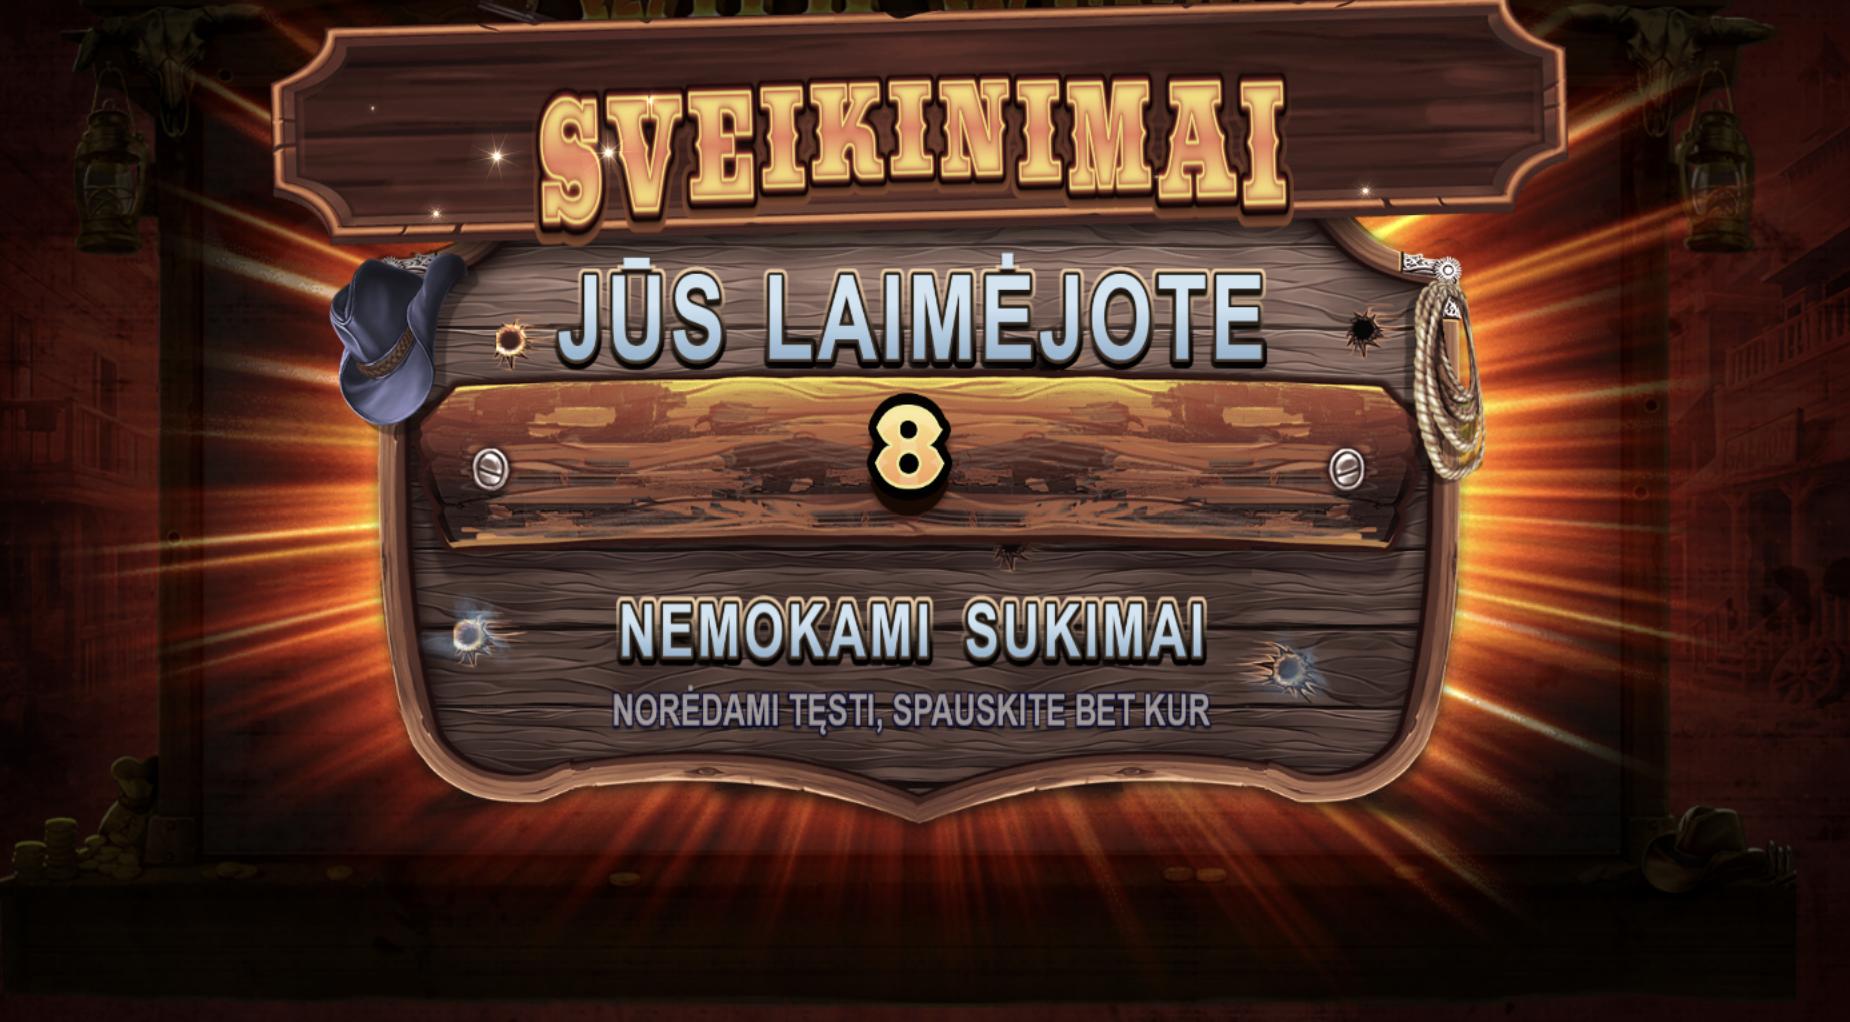 8 wild west gold nemokami sukimai